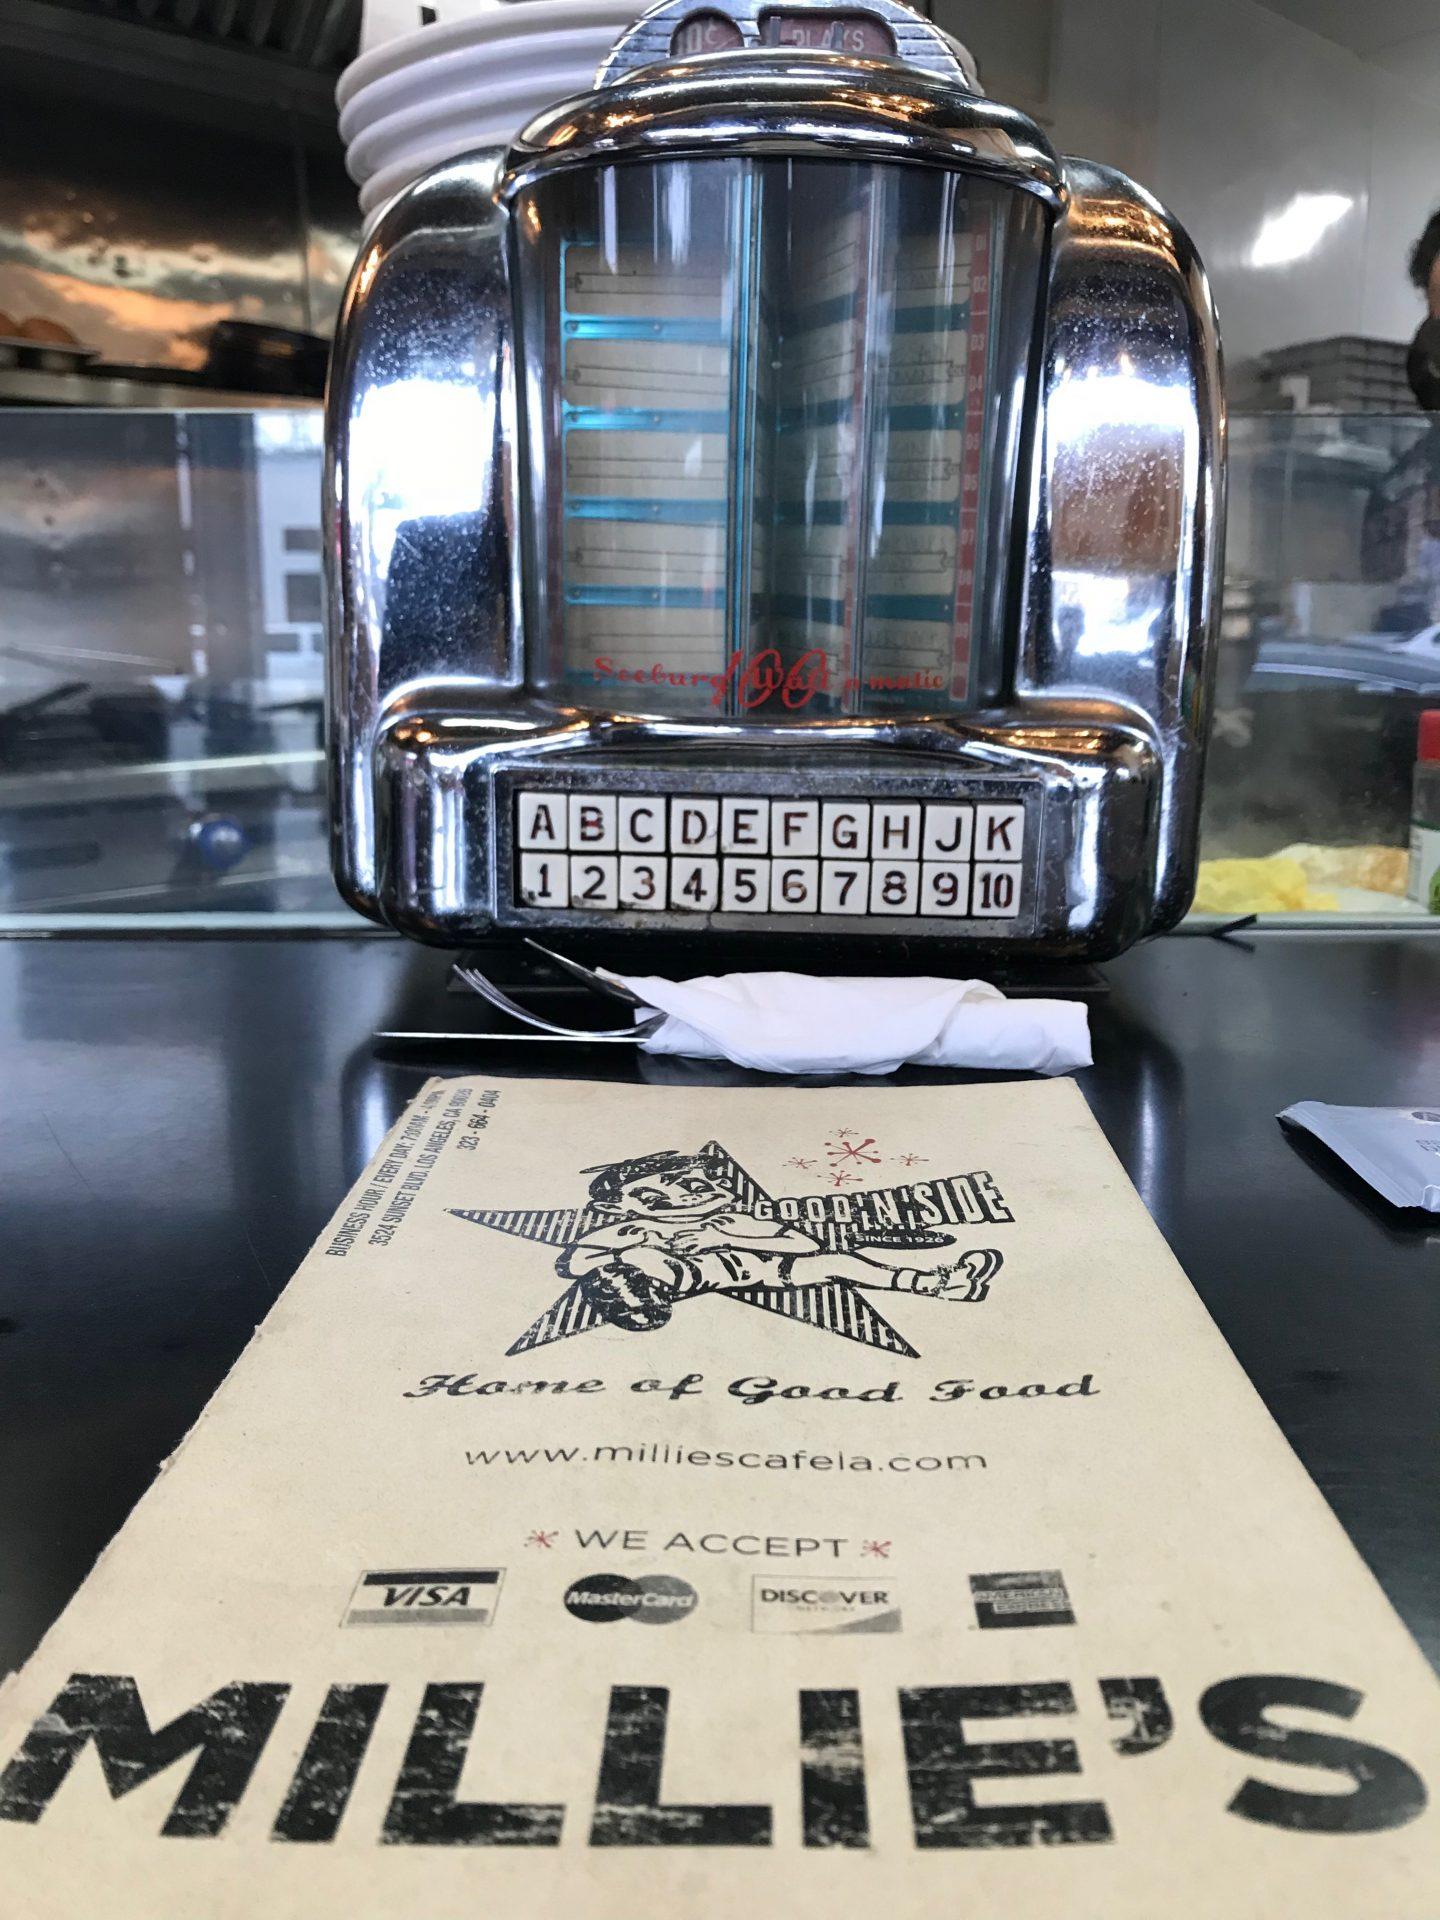 Millie's Cafè